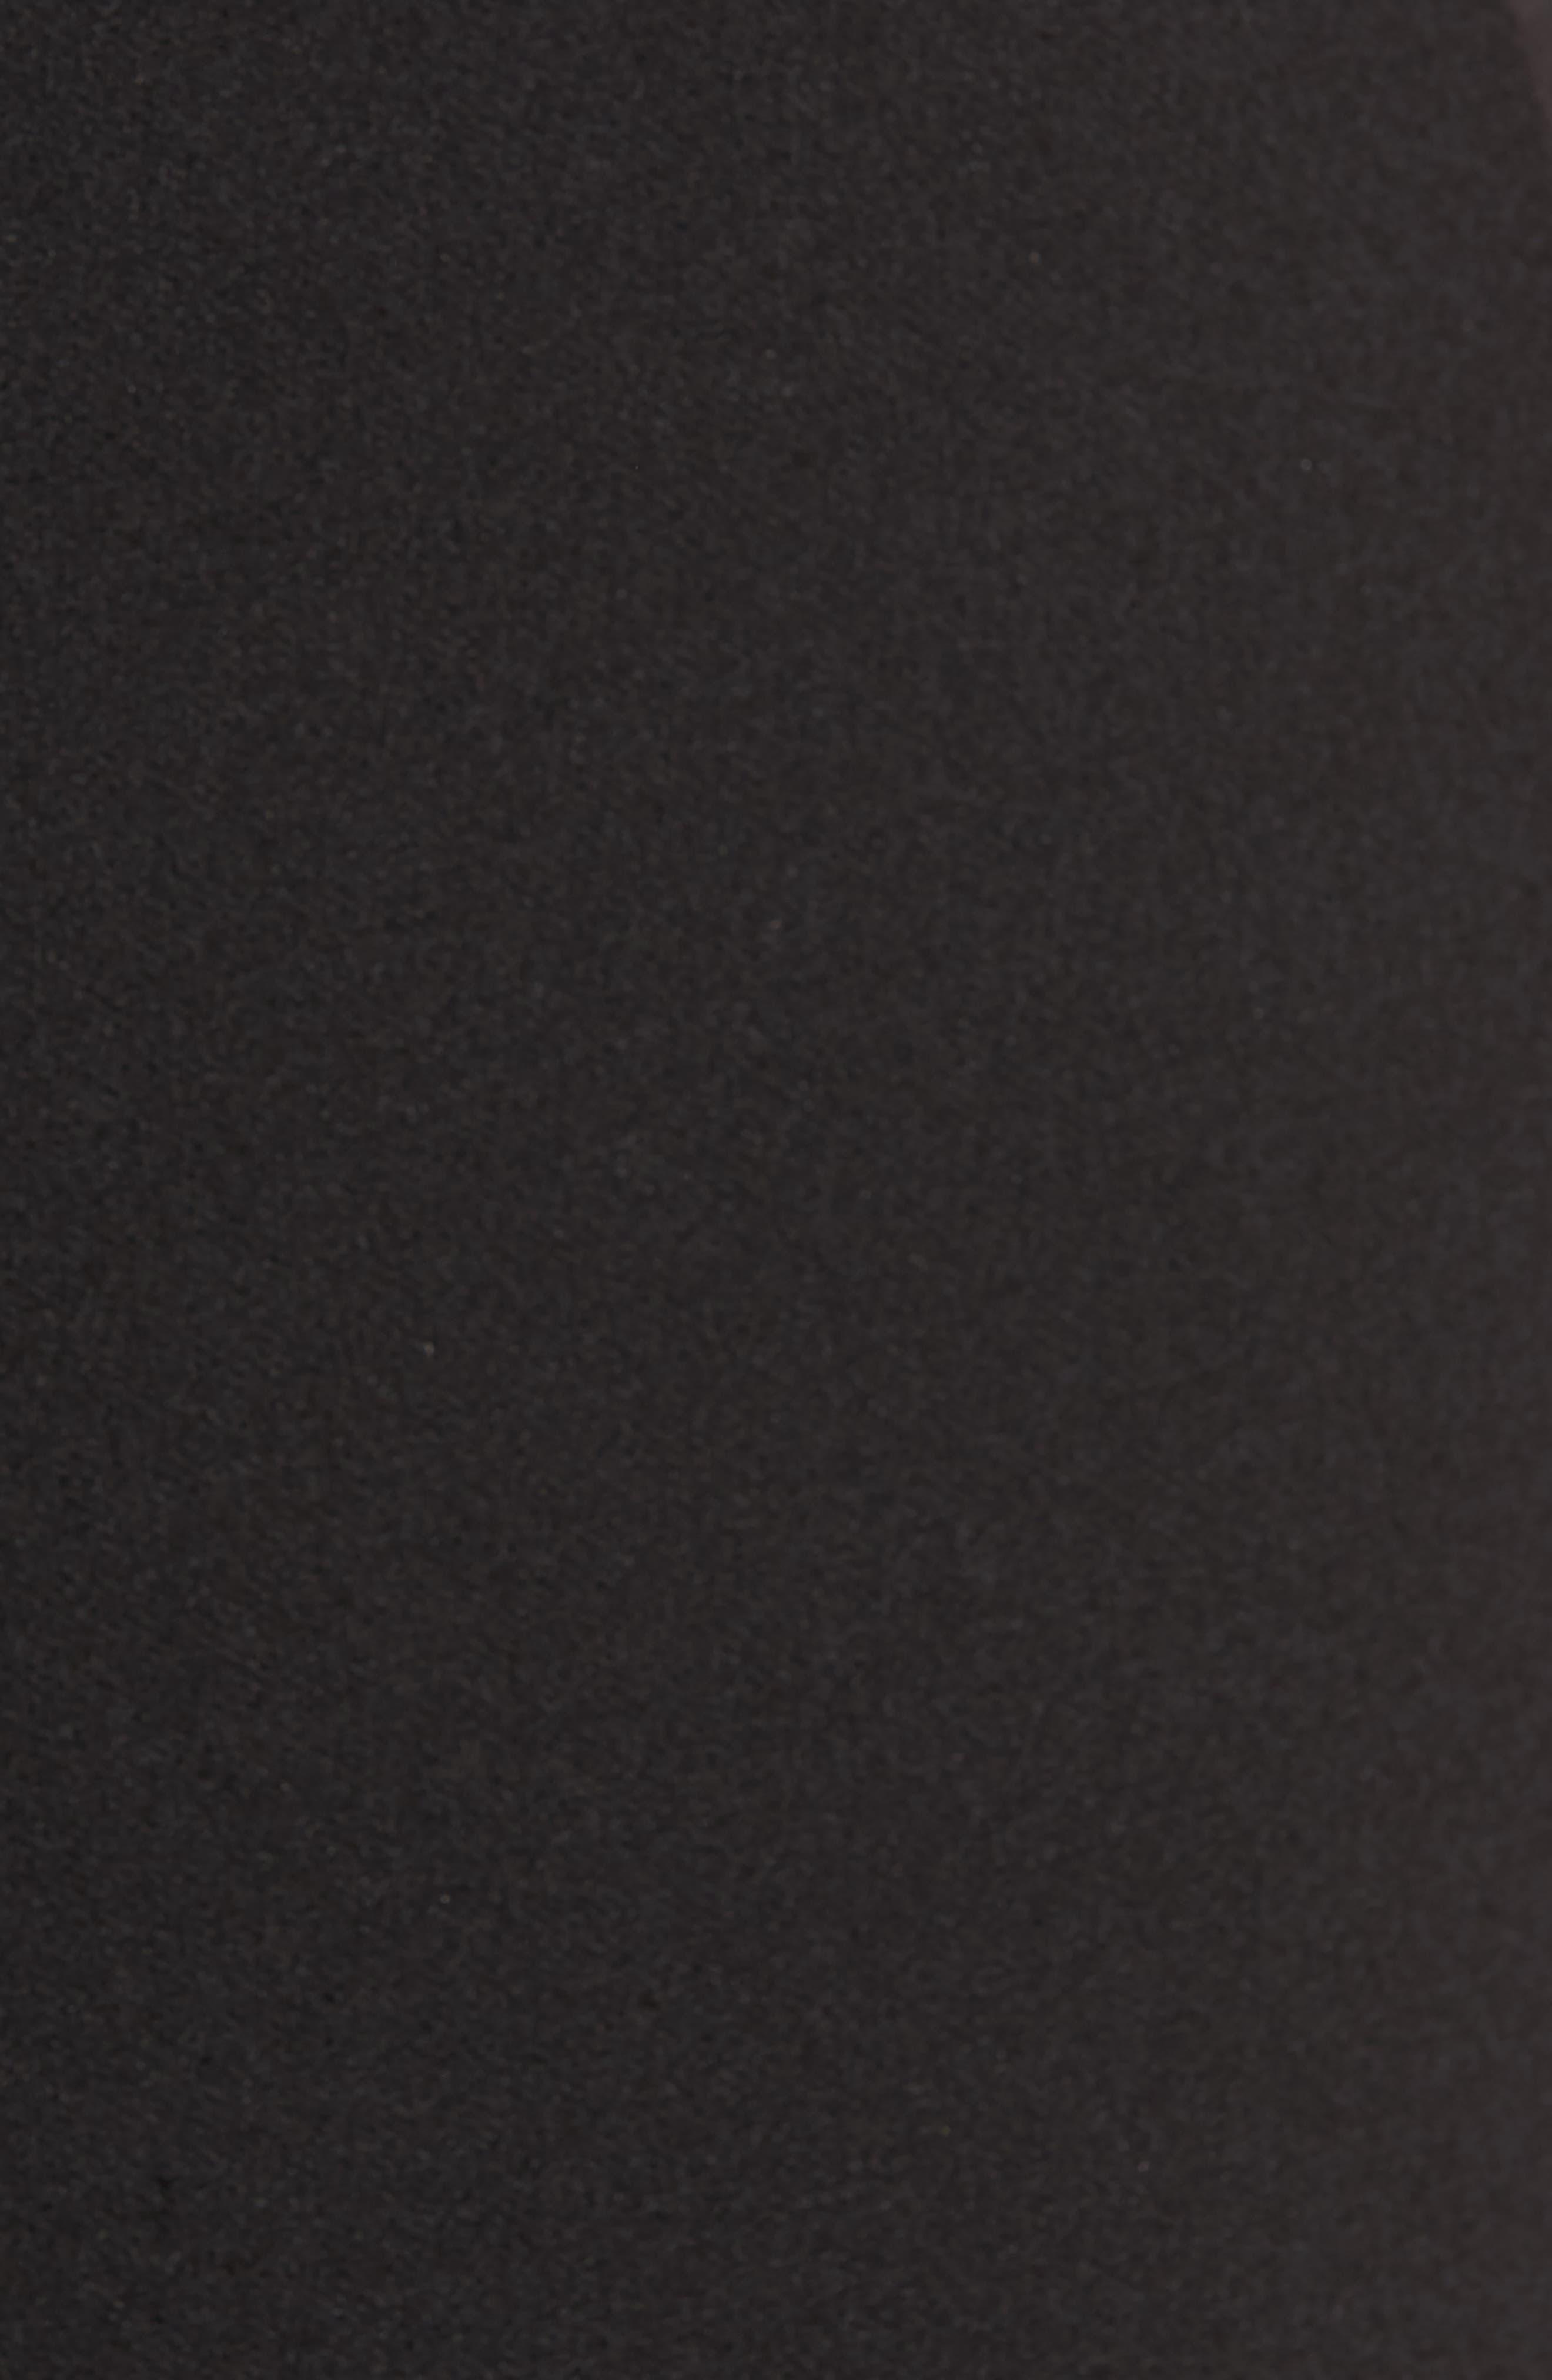 Lou Lou High Waist Crop Slim Trousers,                             Alternate thumbnail 5, color,                             001